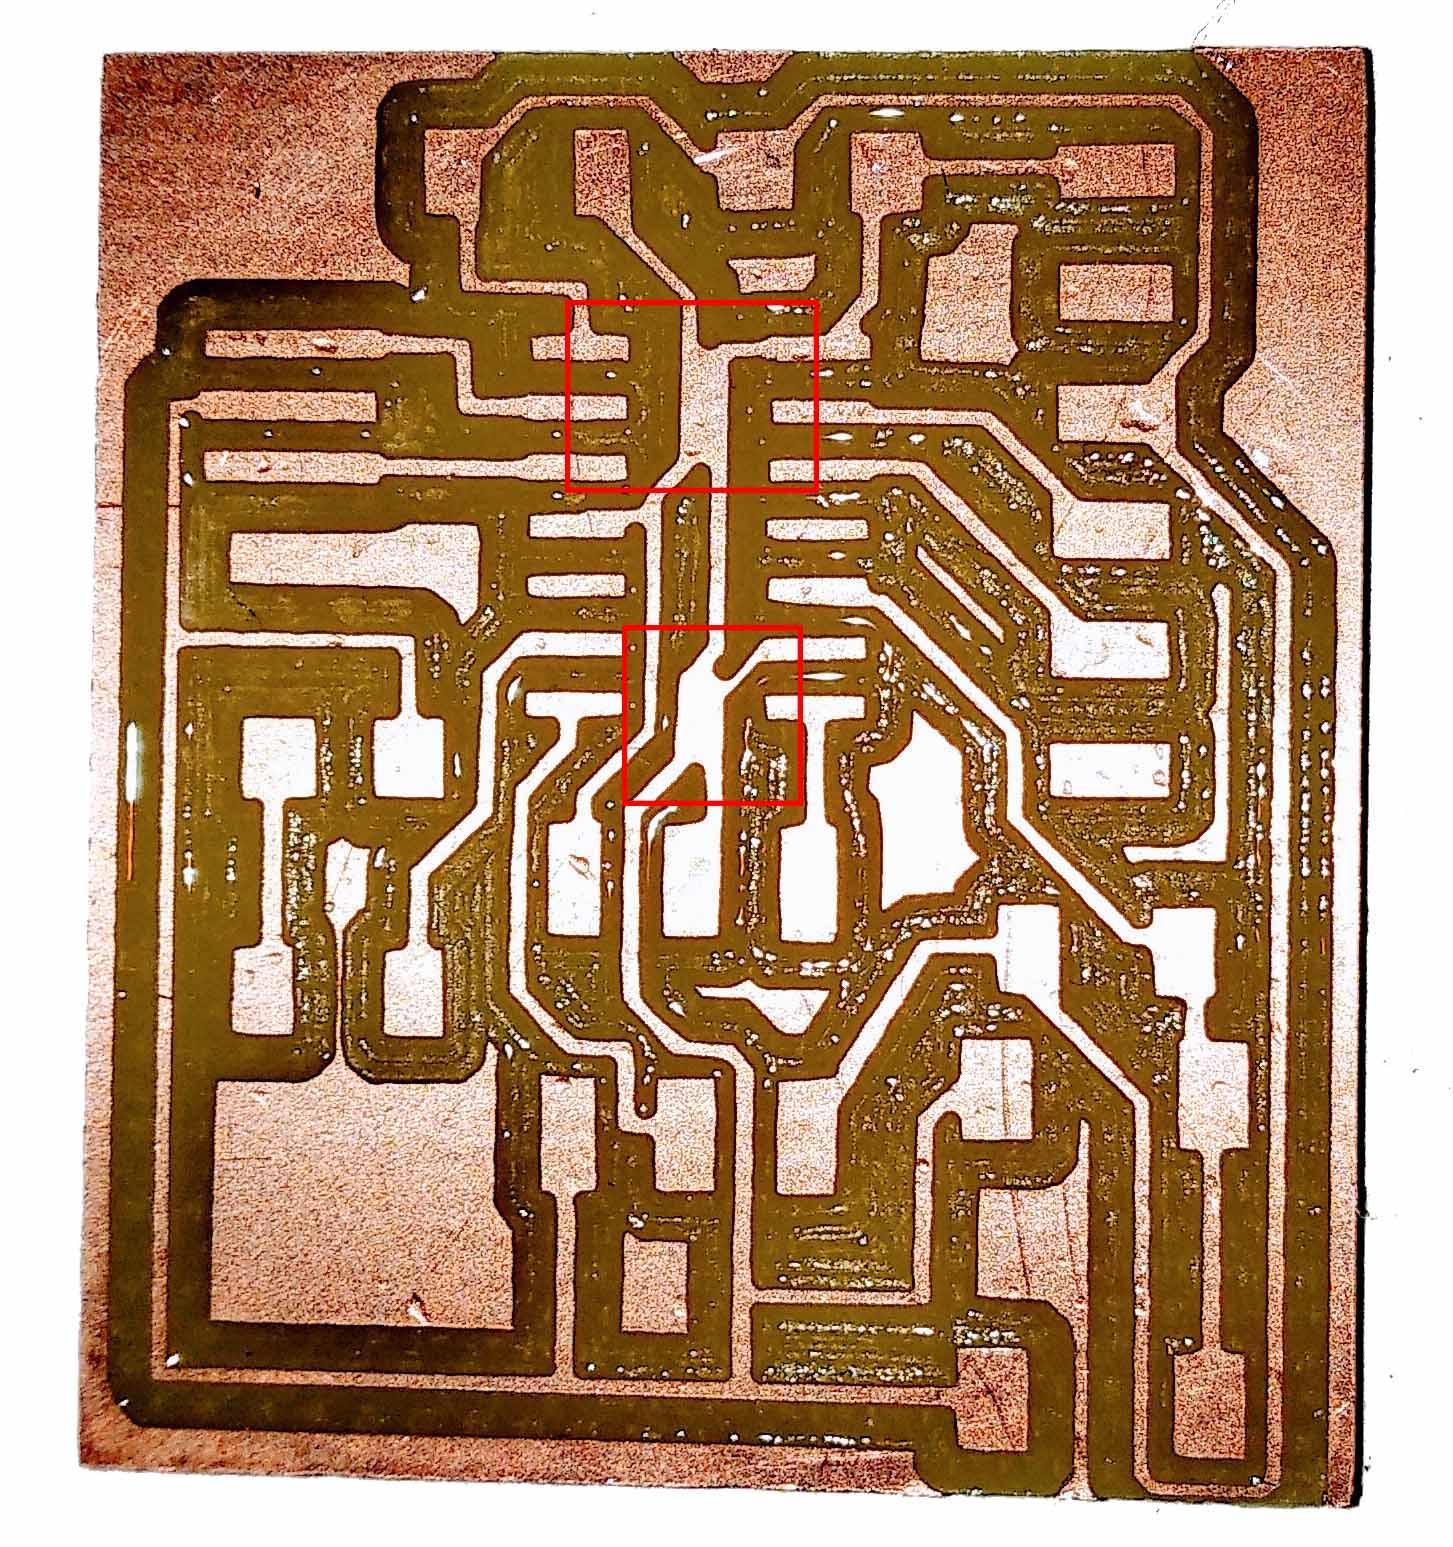 Mrehan Elshehawy How To Fix A Short Circuit Utility Knife Used The Circuits